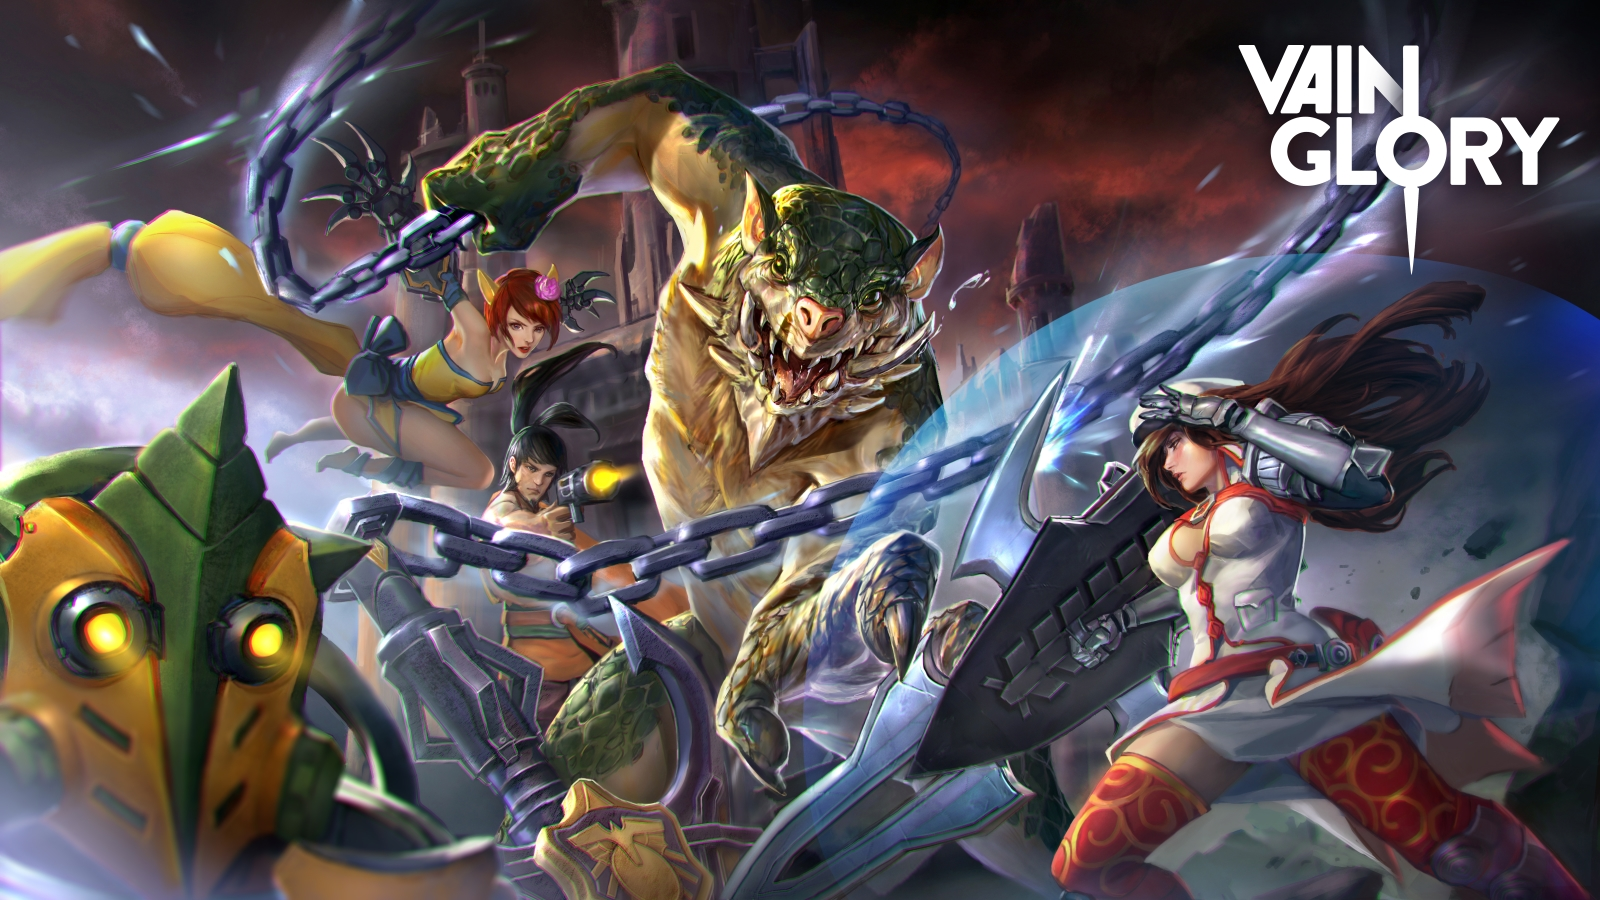 Vainglory Update 1.17 Introduces Battle Royale